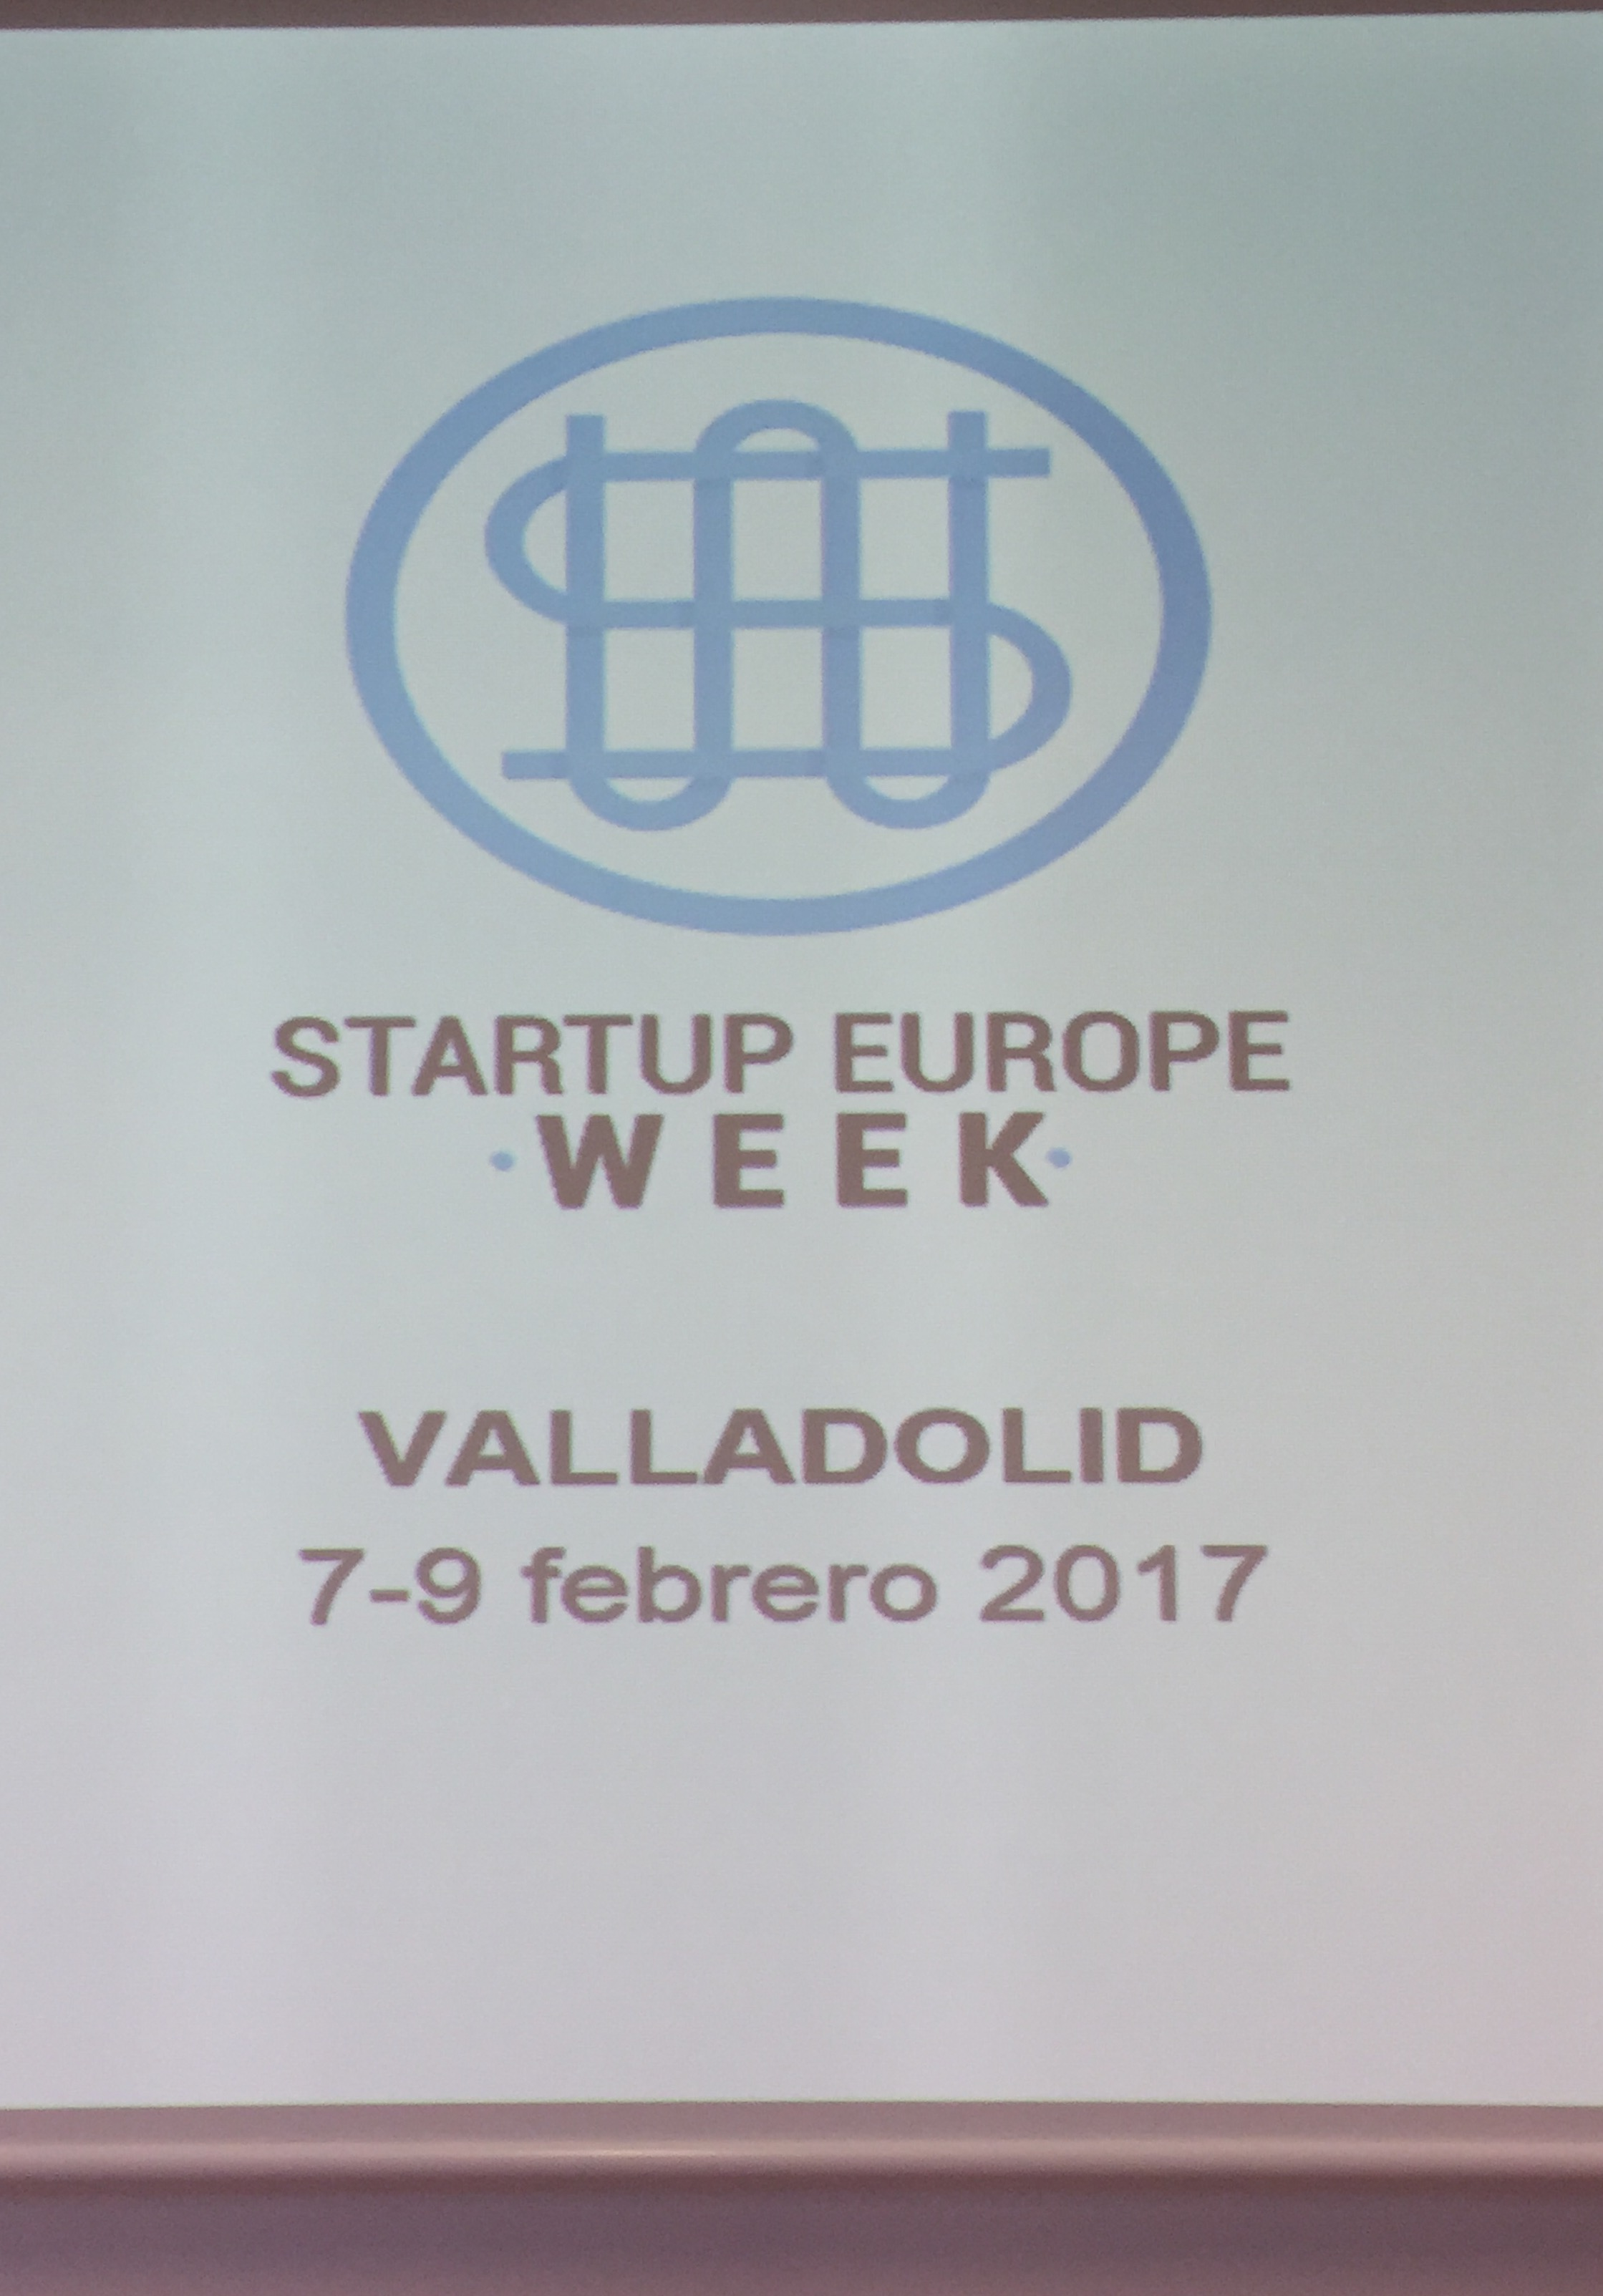 Cartel de Startup Europe Week